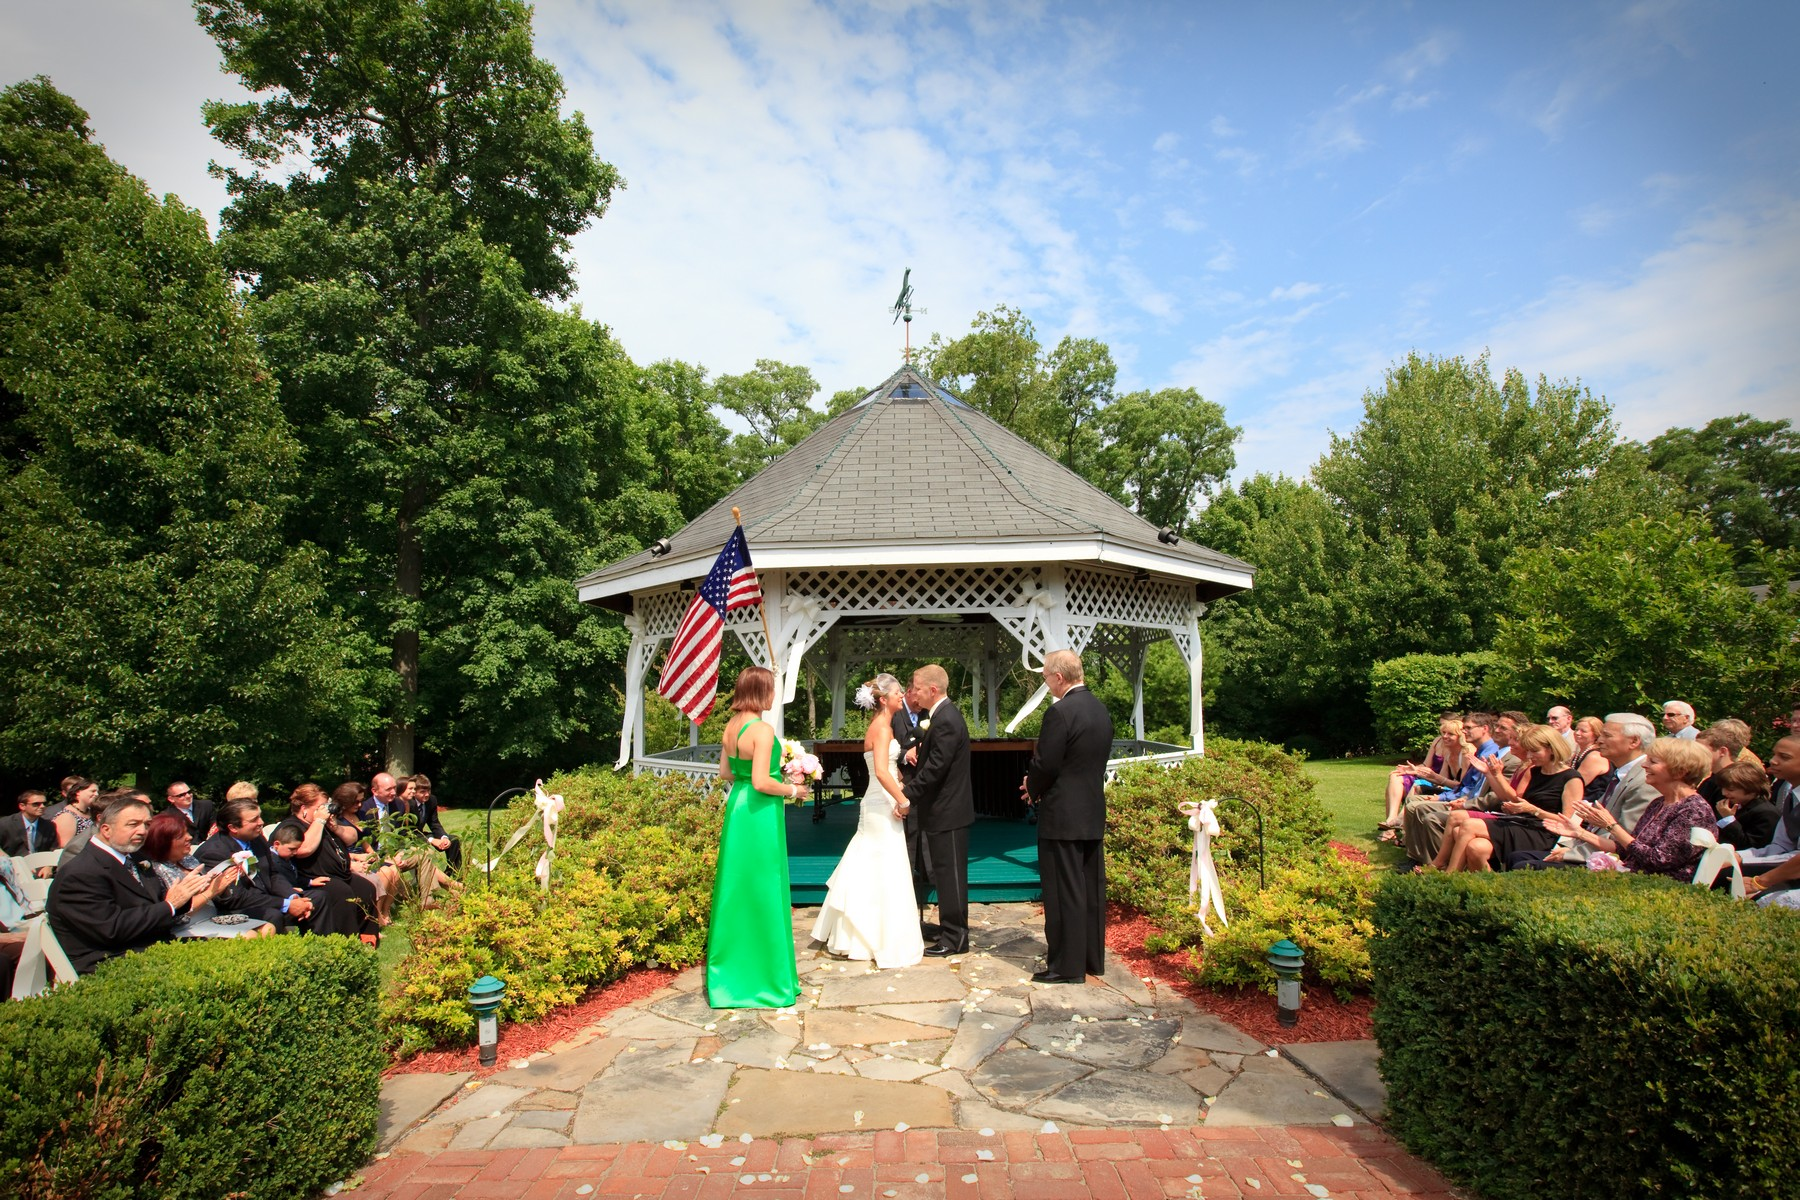 Tara A Country Inn Weddings and Events (2)